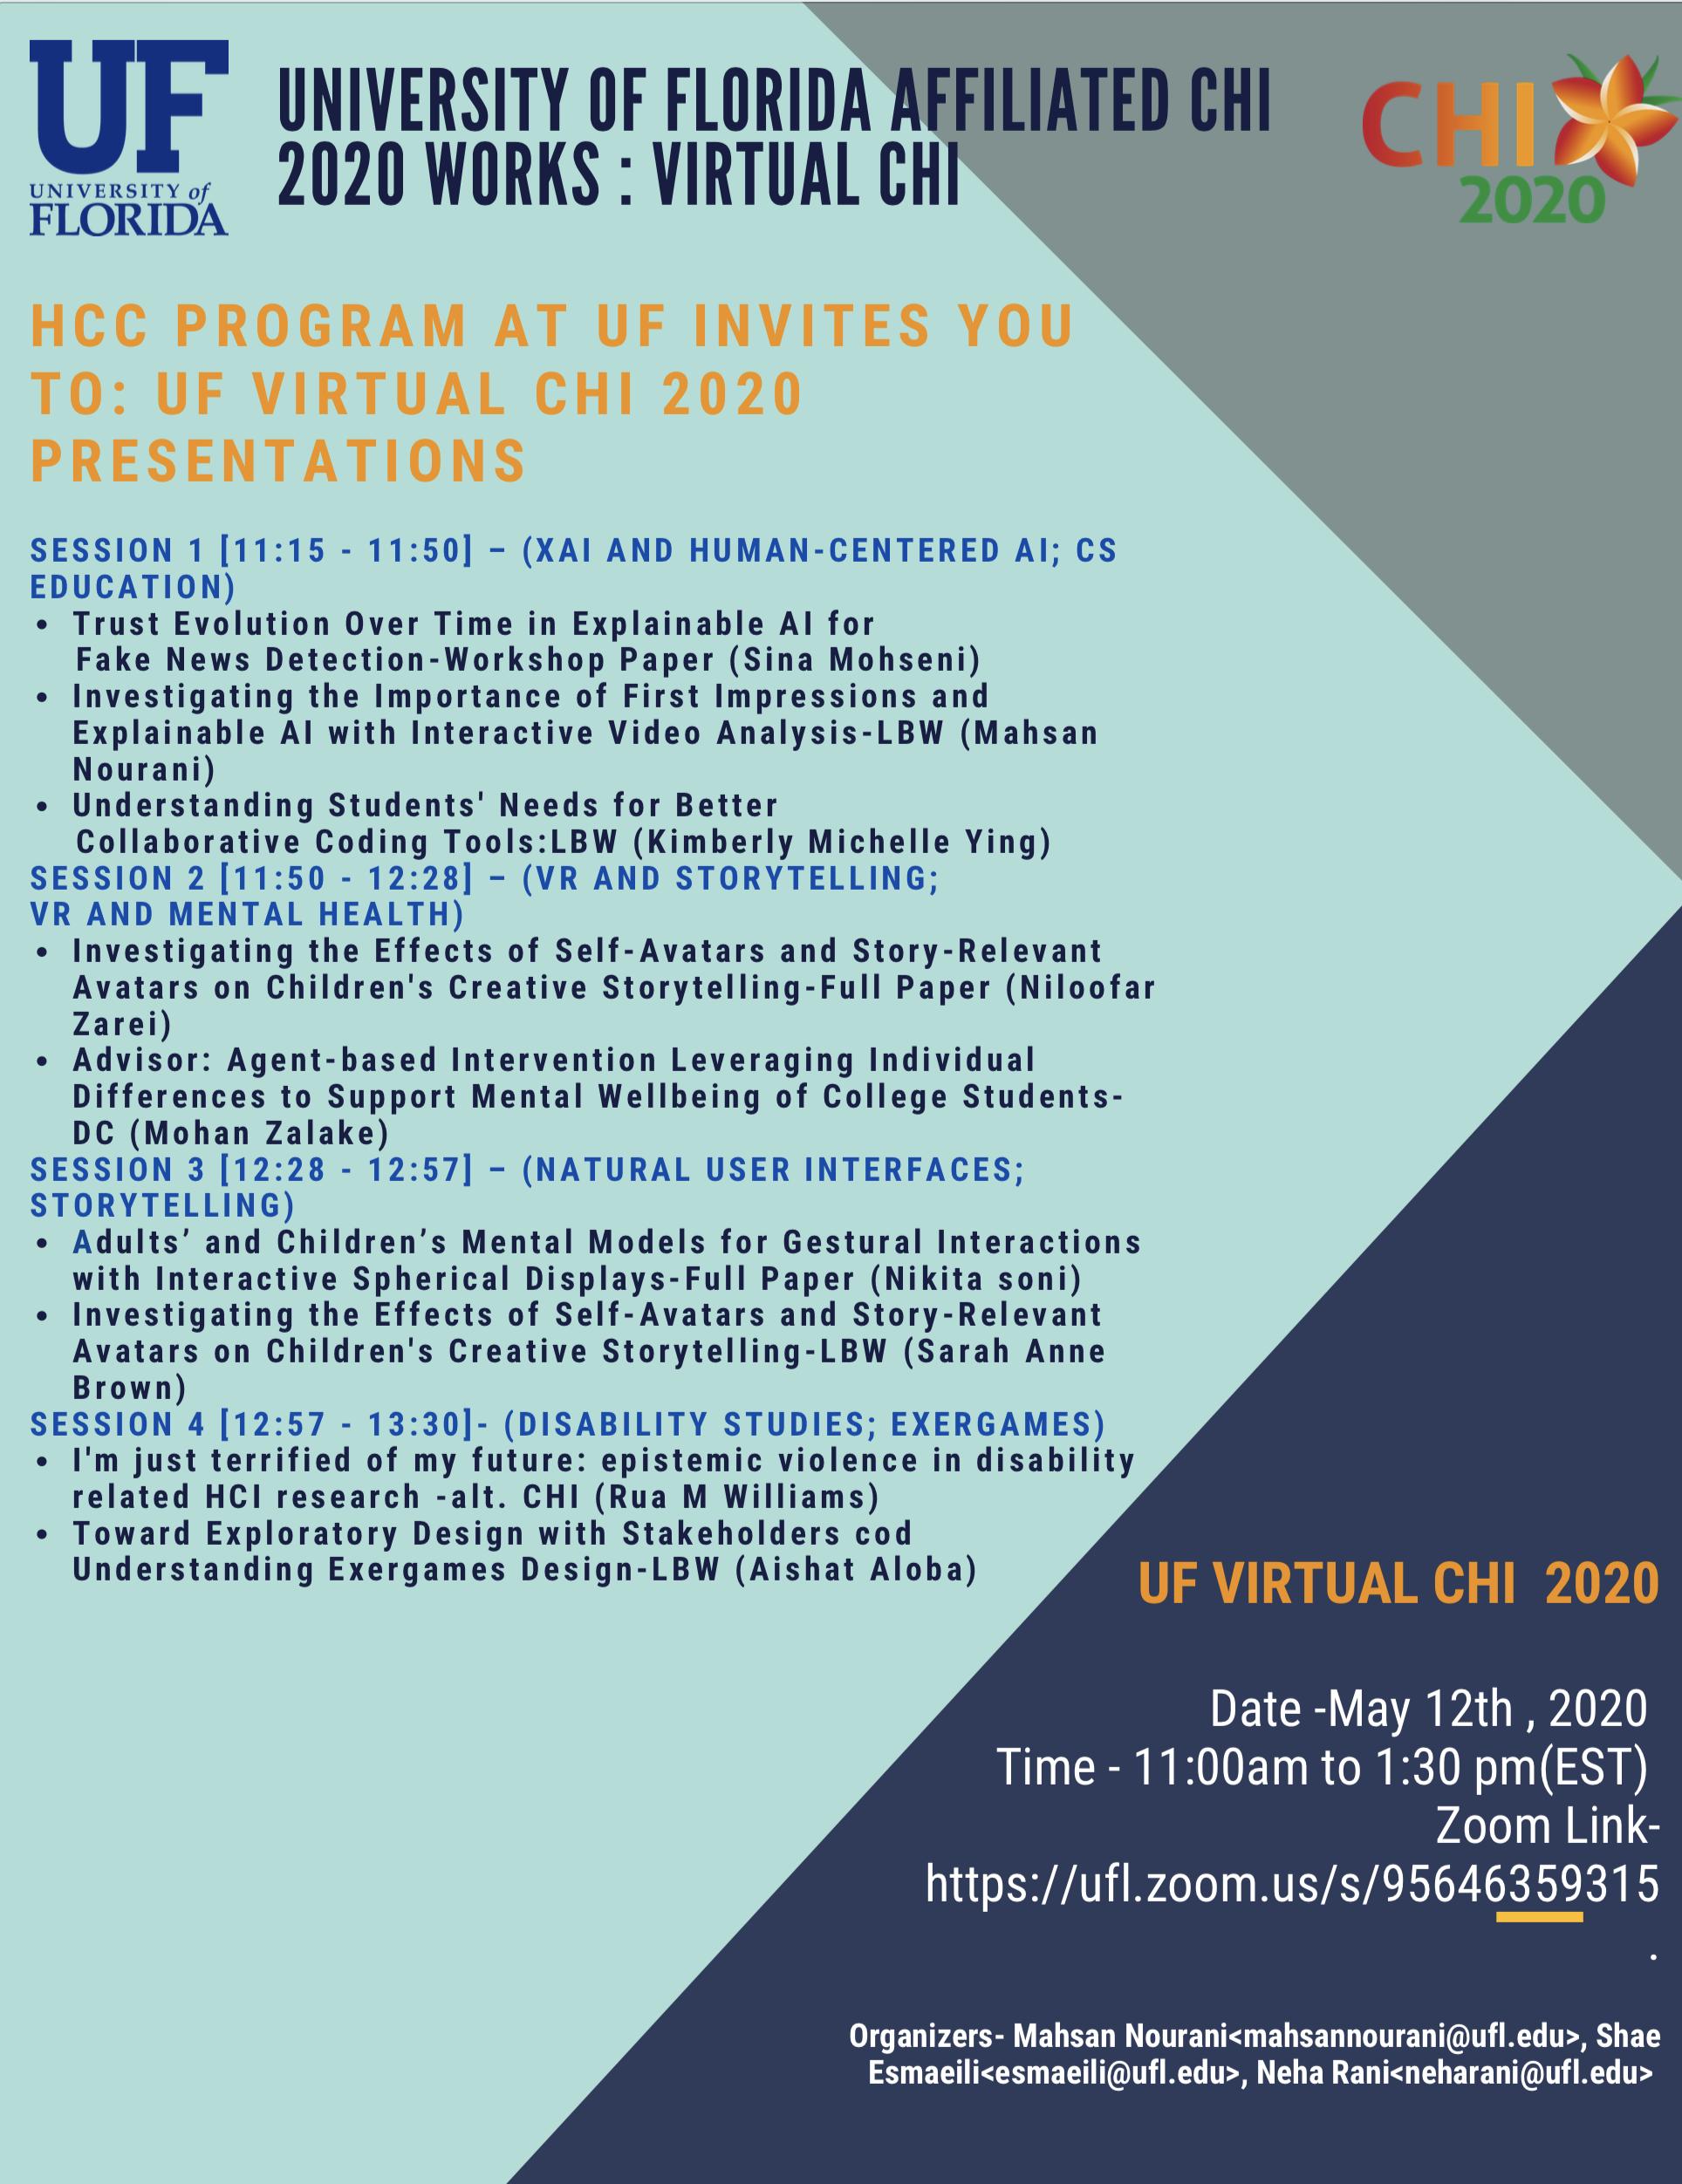 UF Affiliated CHI 2020 Presentations (Virtual)